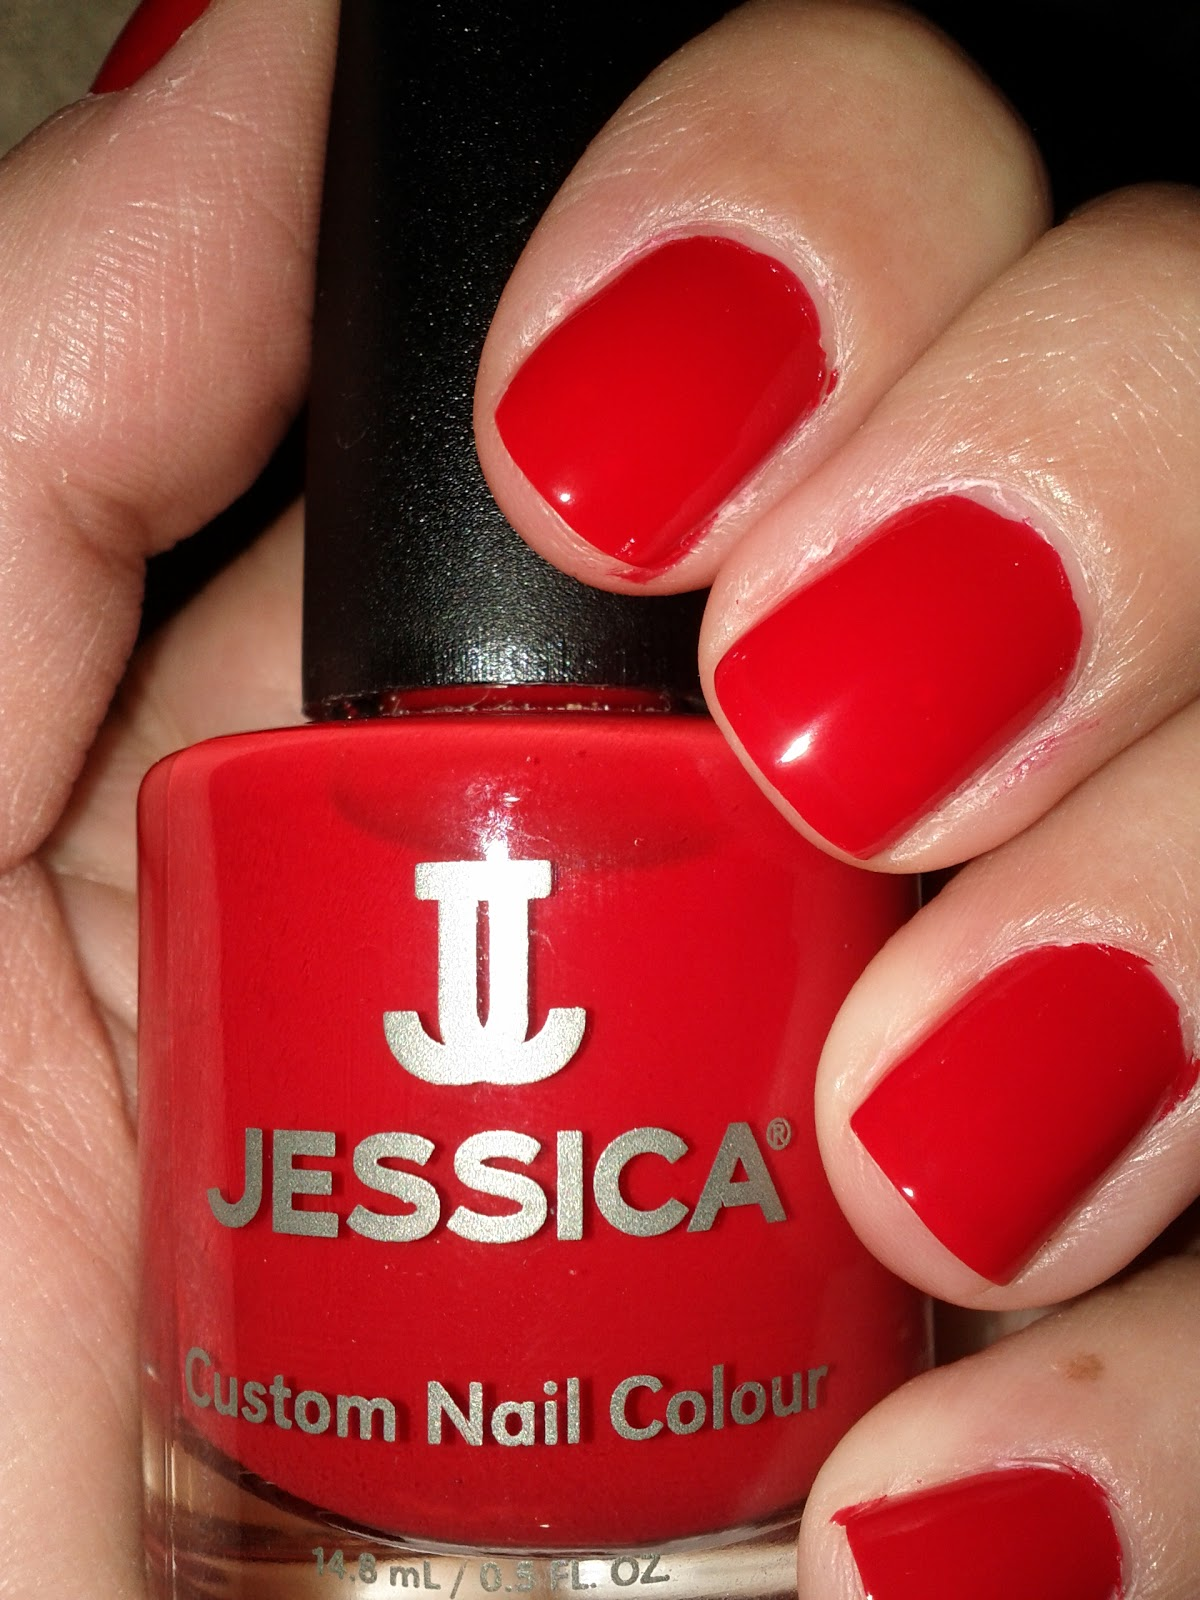 Lipgloss Break: jessica nail polish